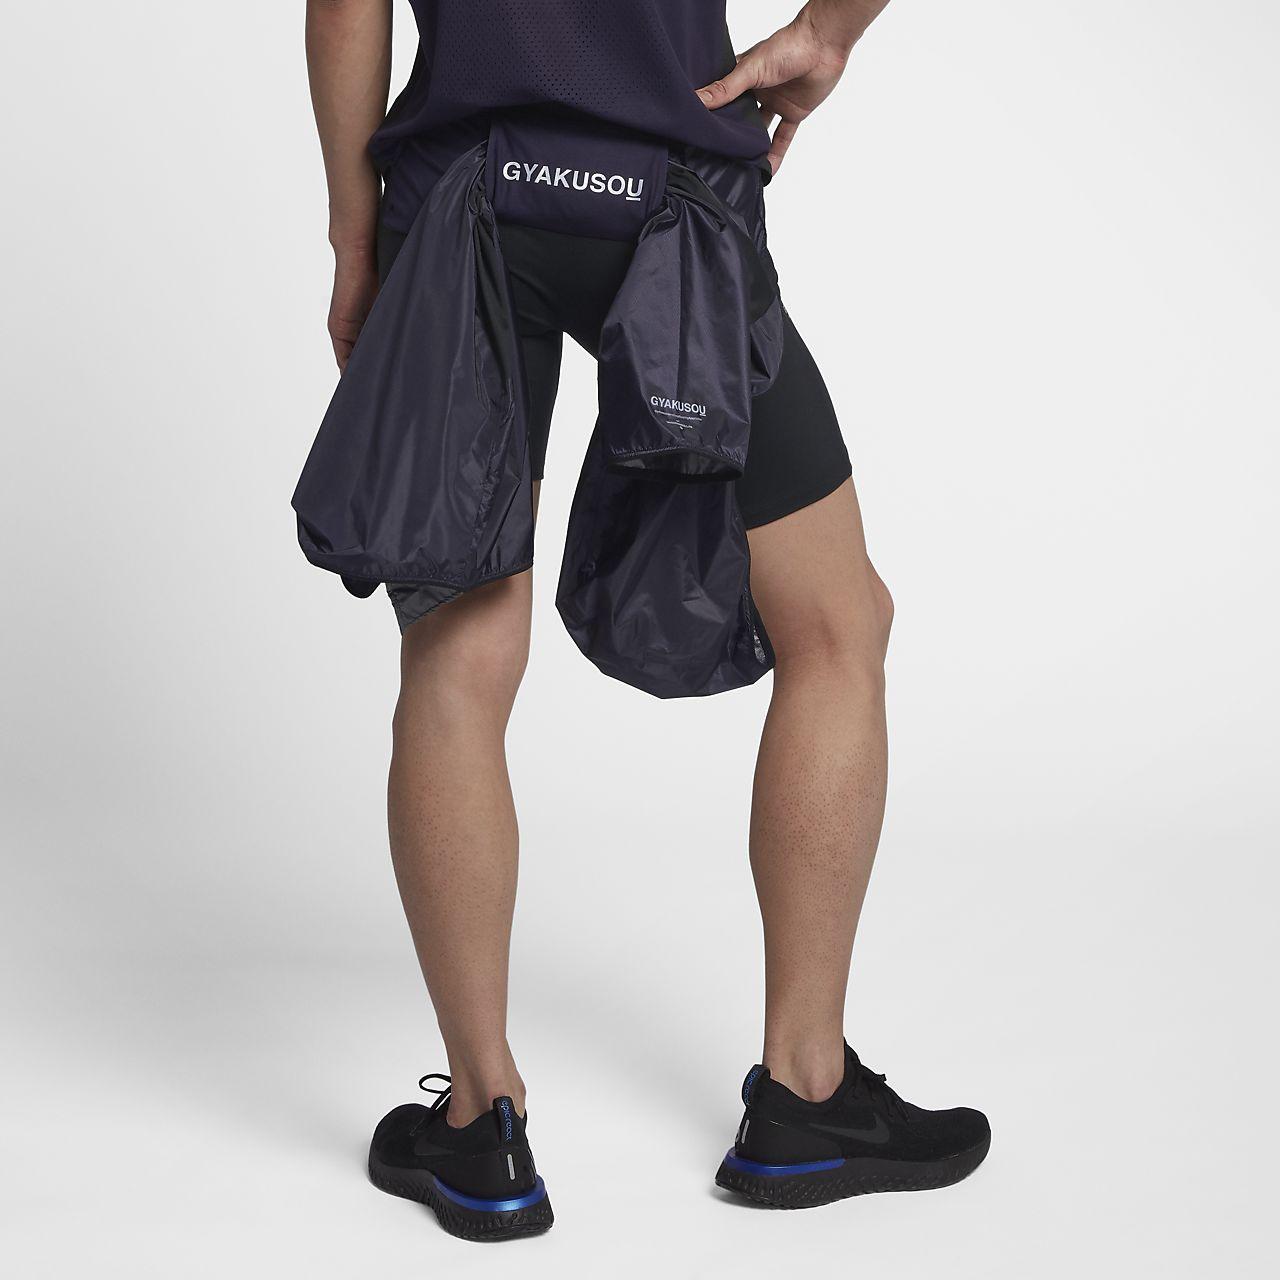 X Nike X Gyakusou Short Nike Femme qMLpzjSUVG